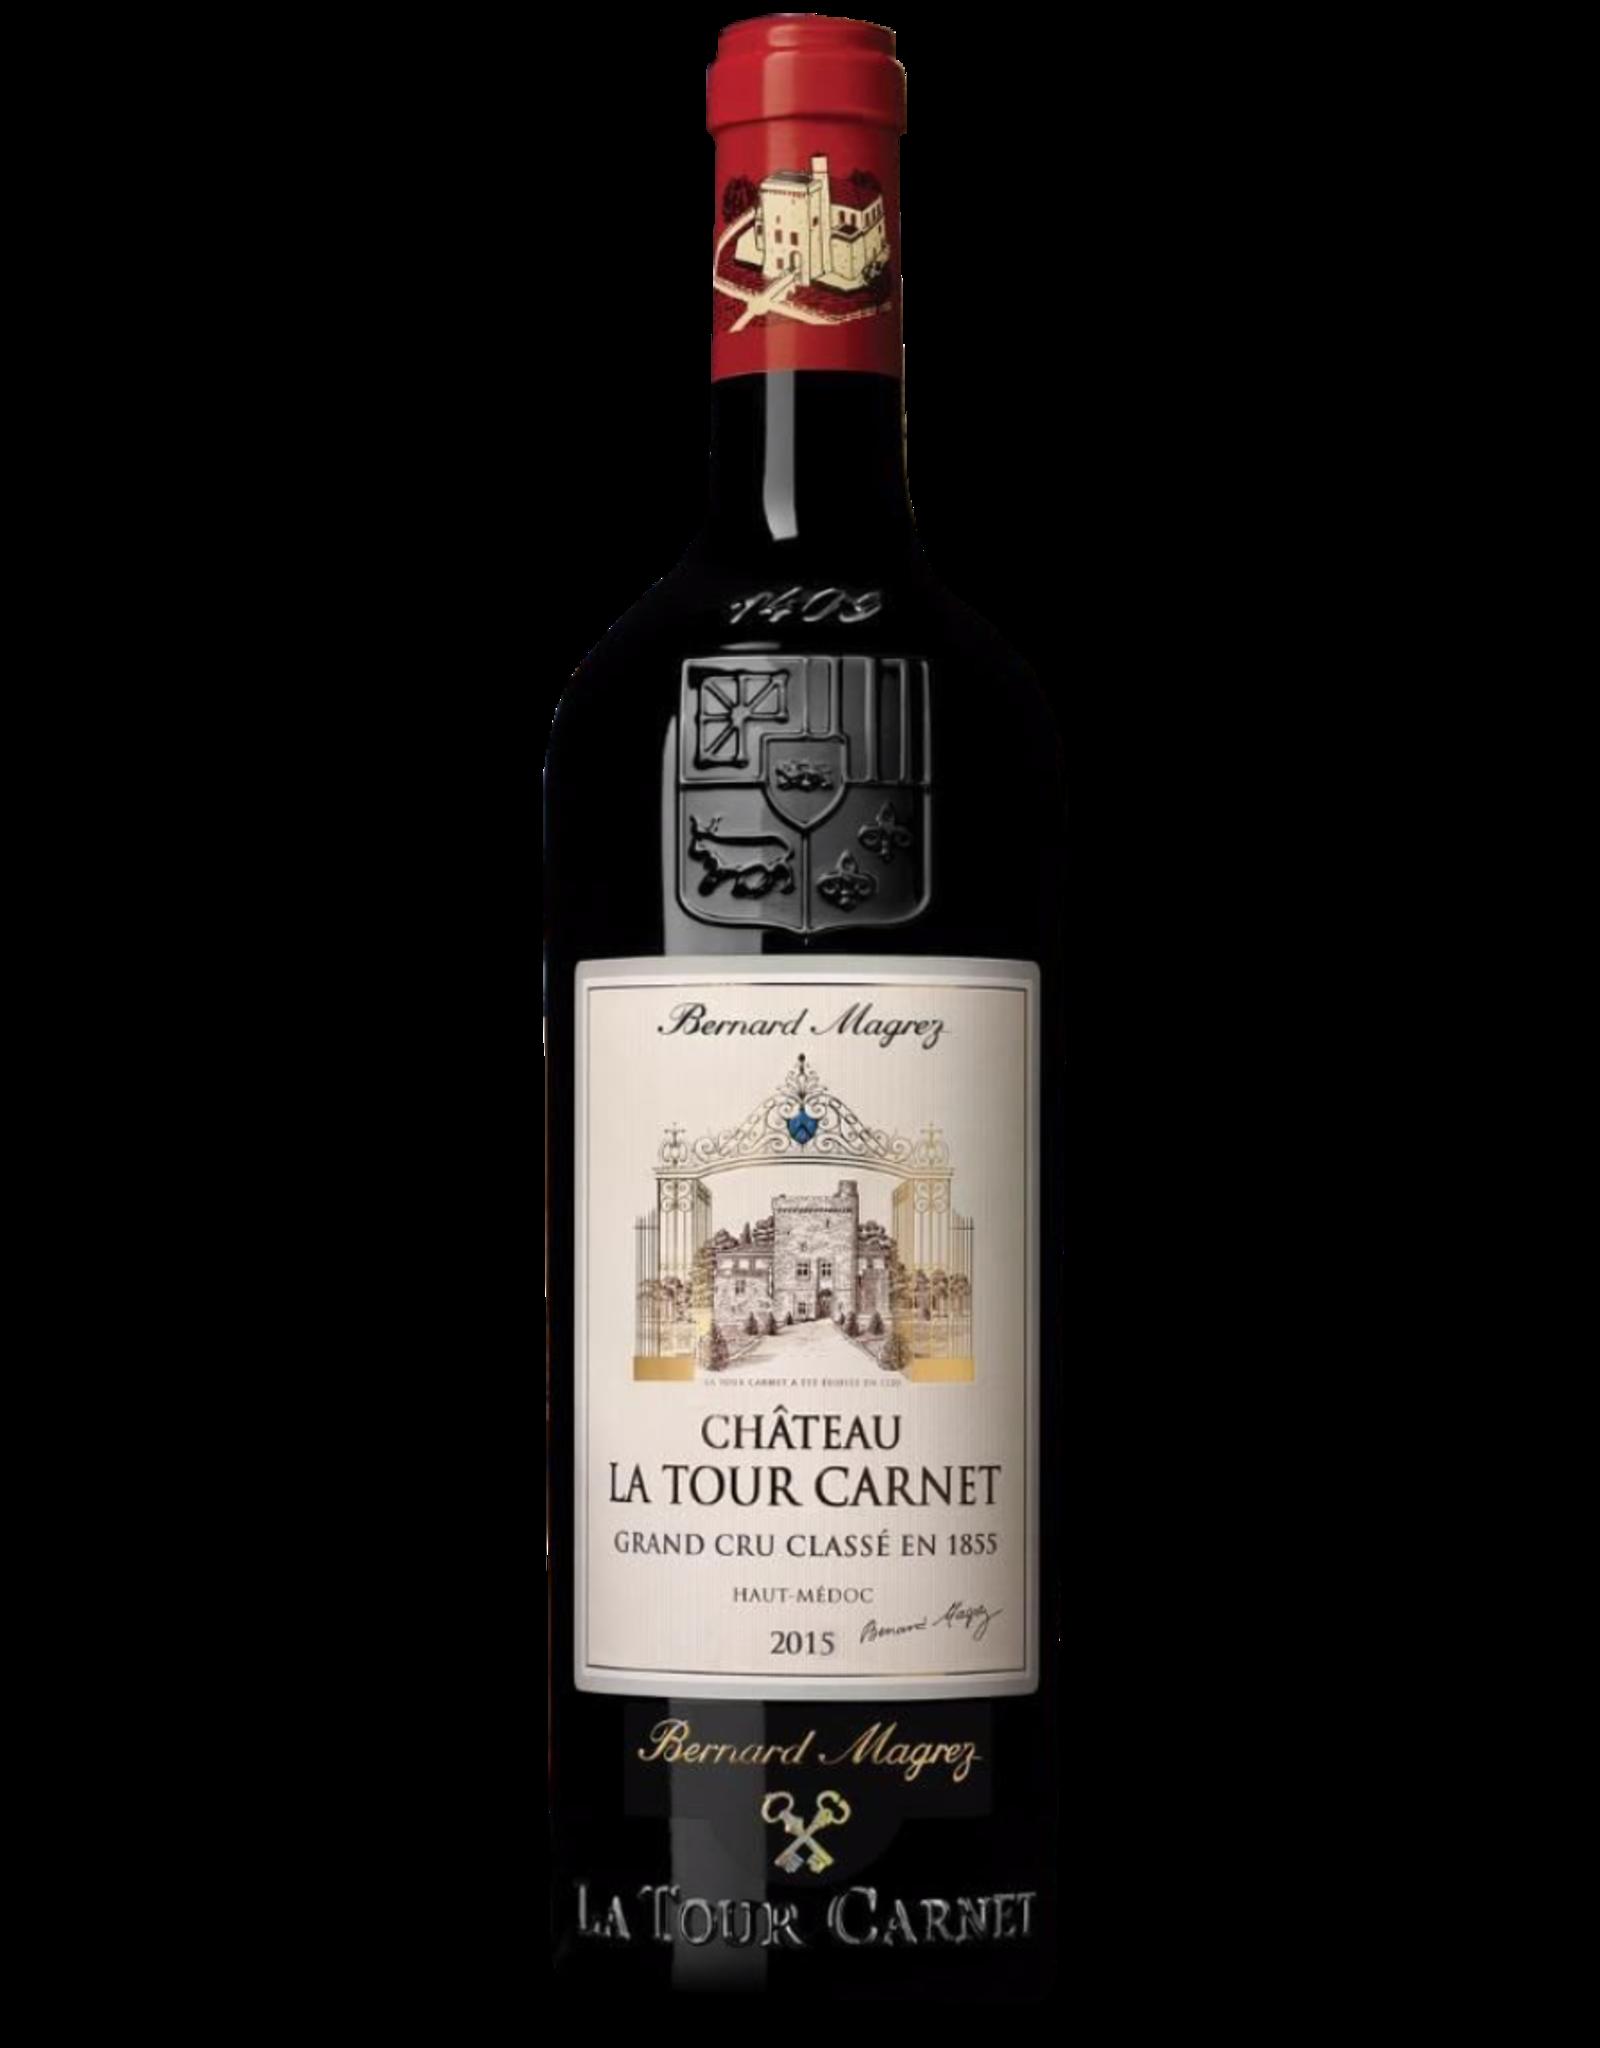 Château La Tour Carnet Château La Tour Carnet 2017 - Haut-Médoc